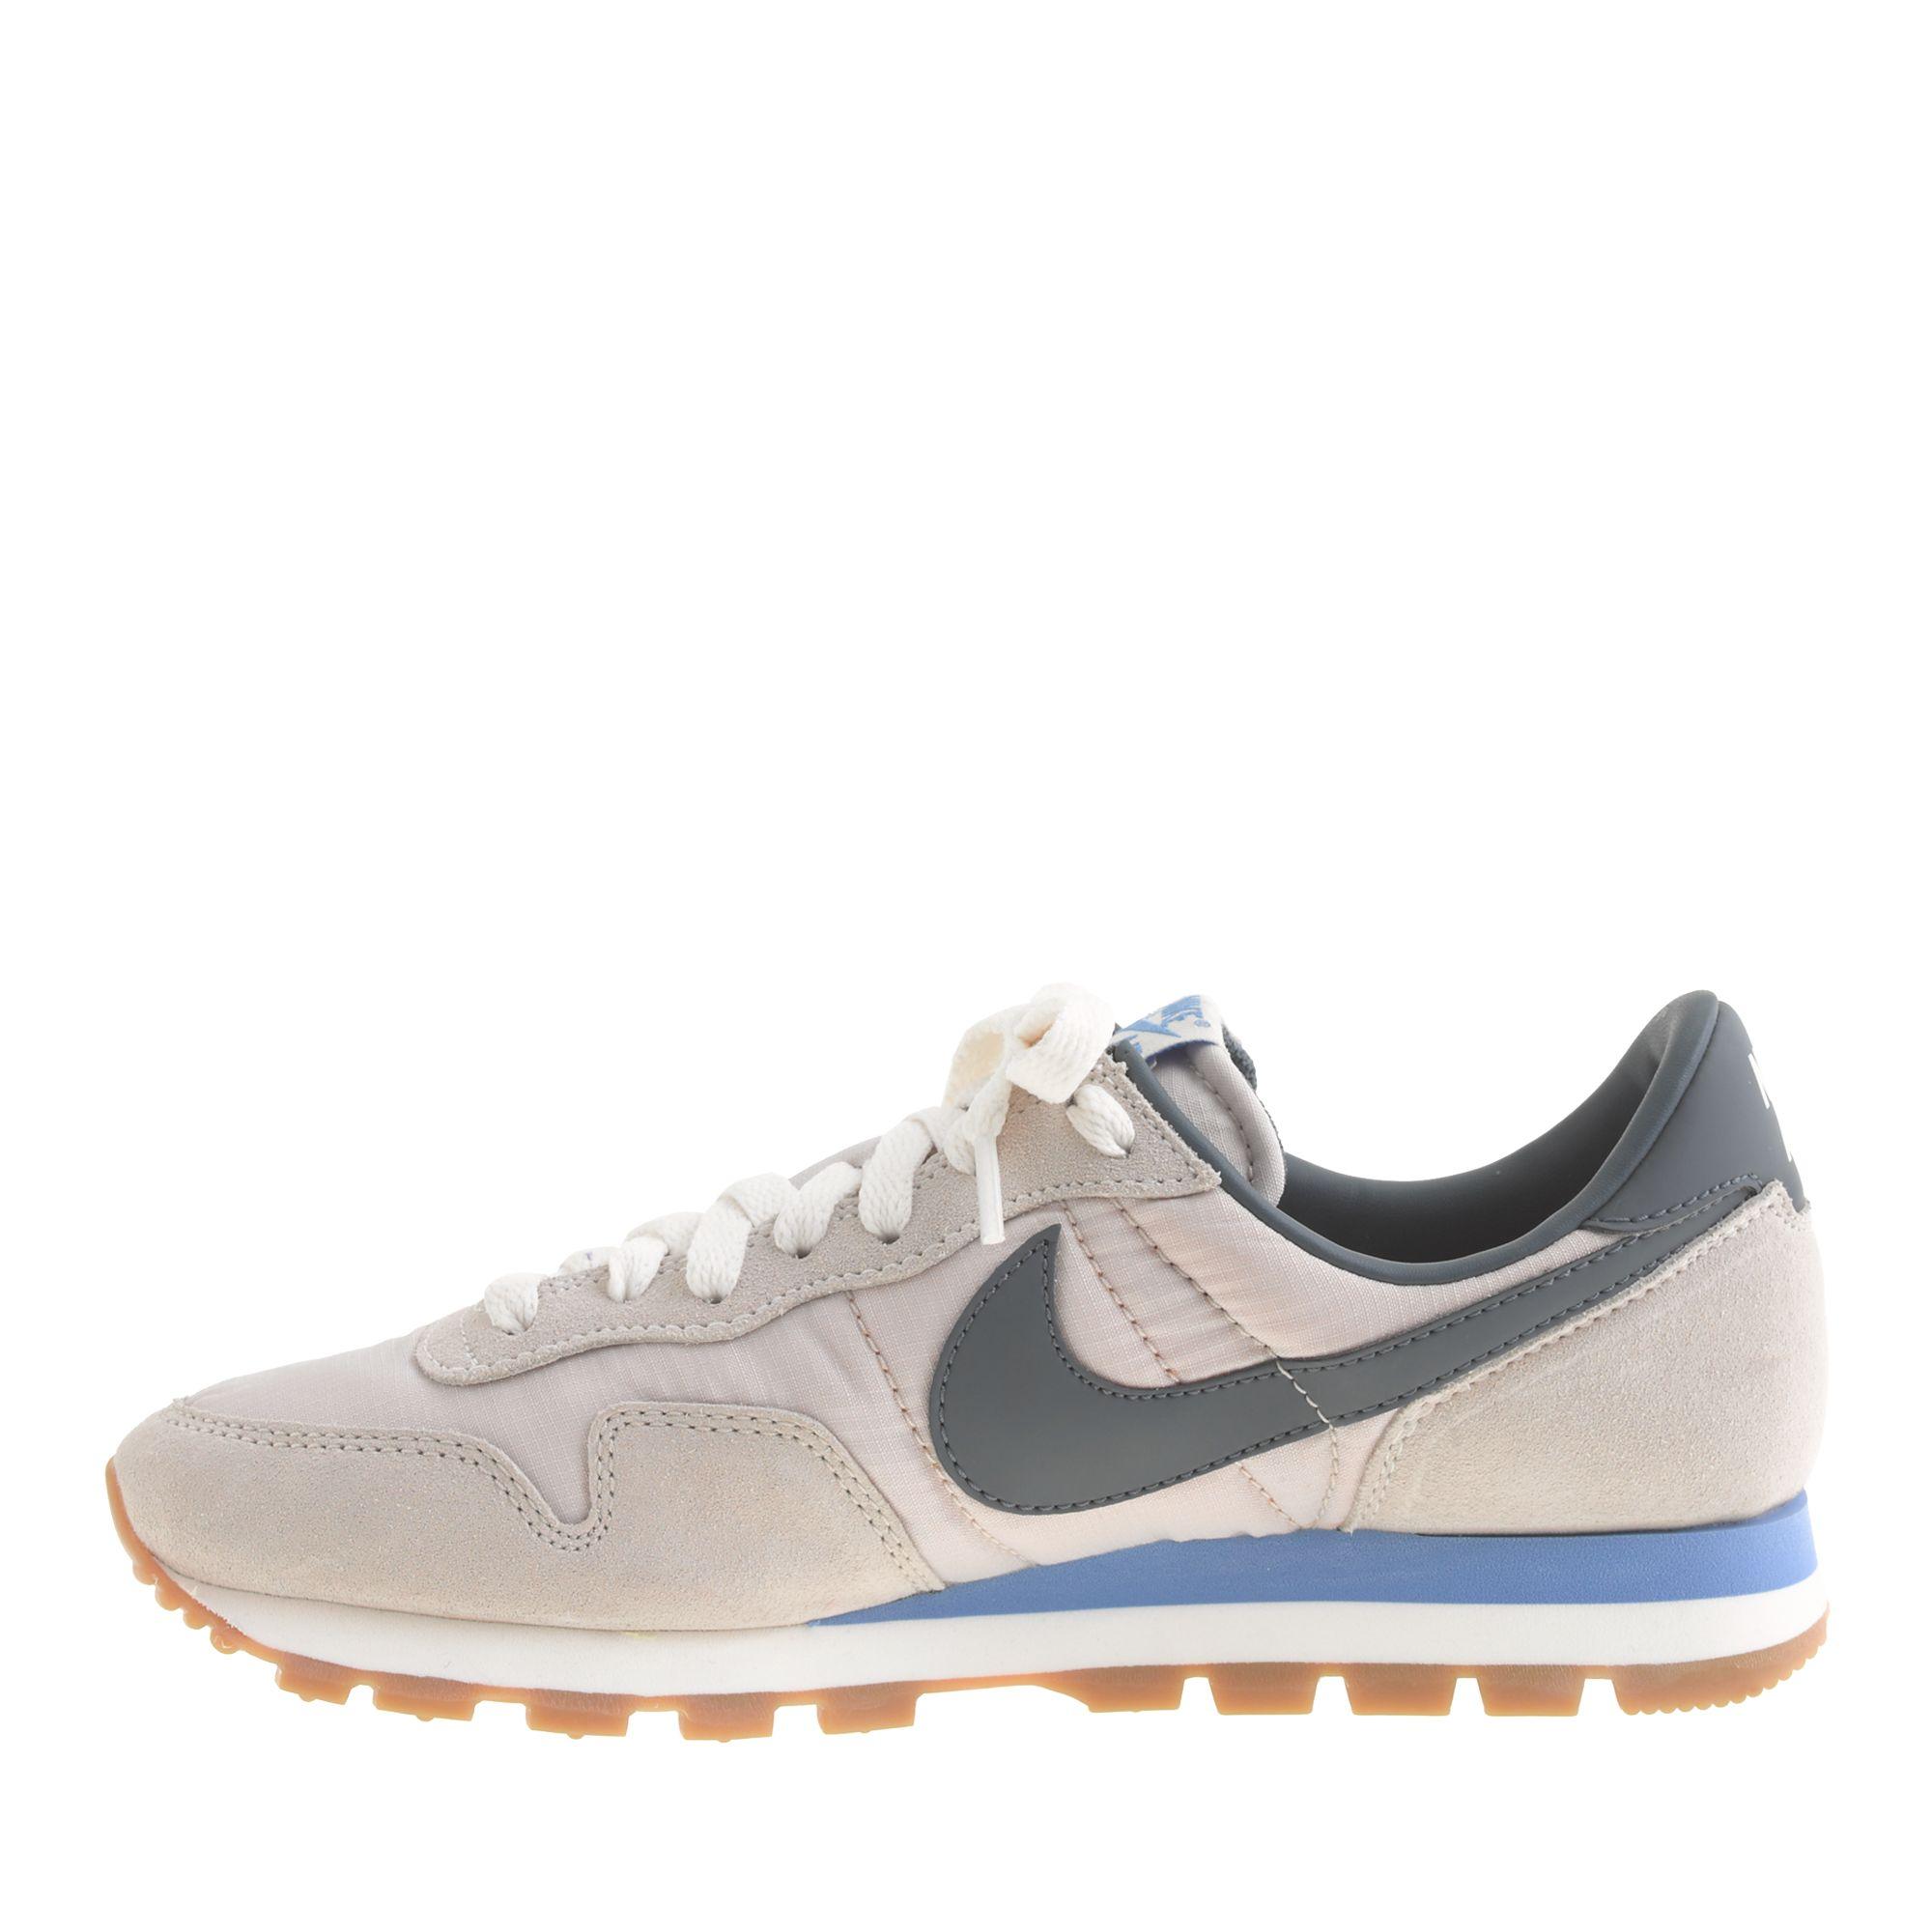 J Crew Nike Womens Shoes